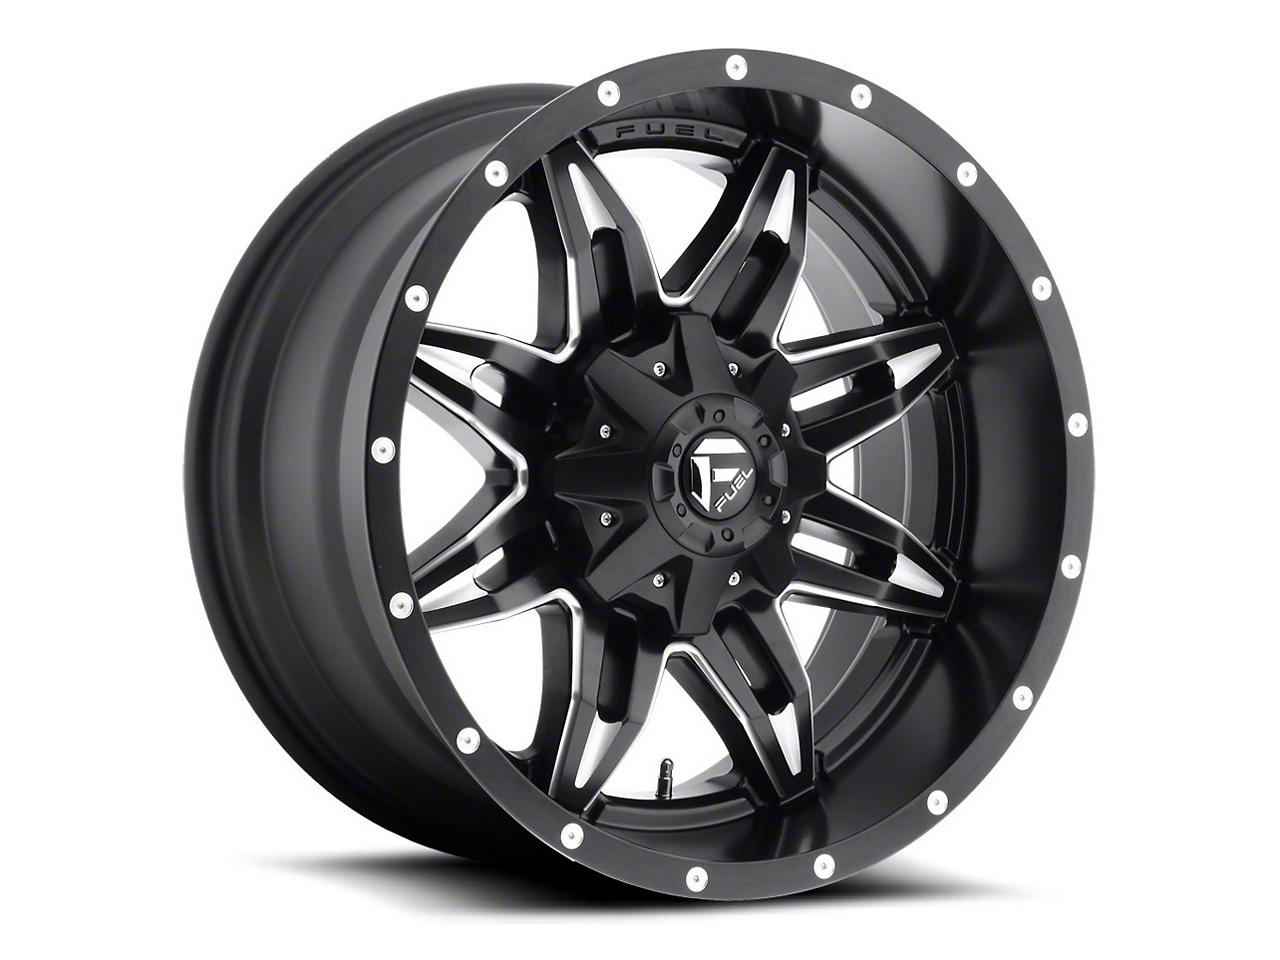 Fuel Wheels Lethal Black Milled 6-Lug Wheel - 20x9 (07-18 Sierra 1500)